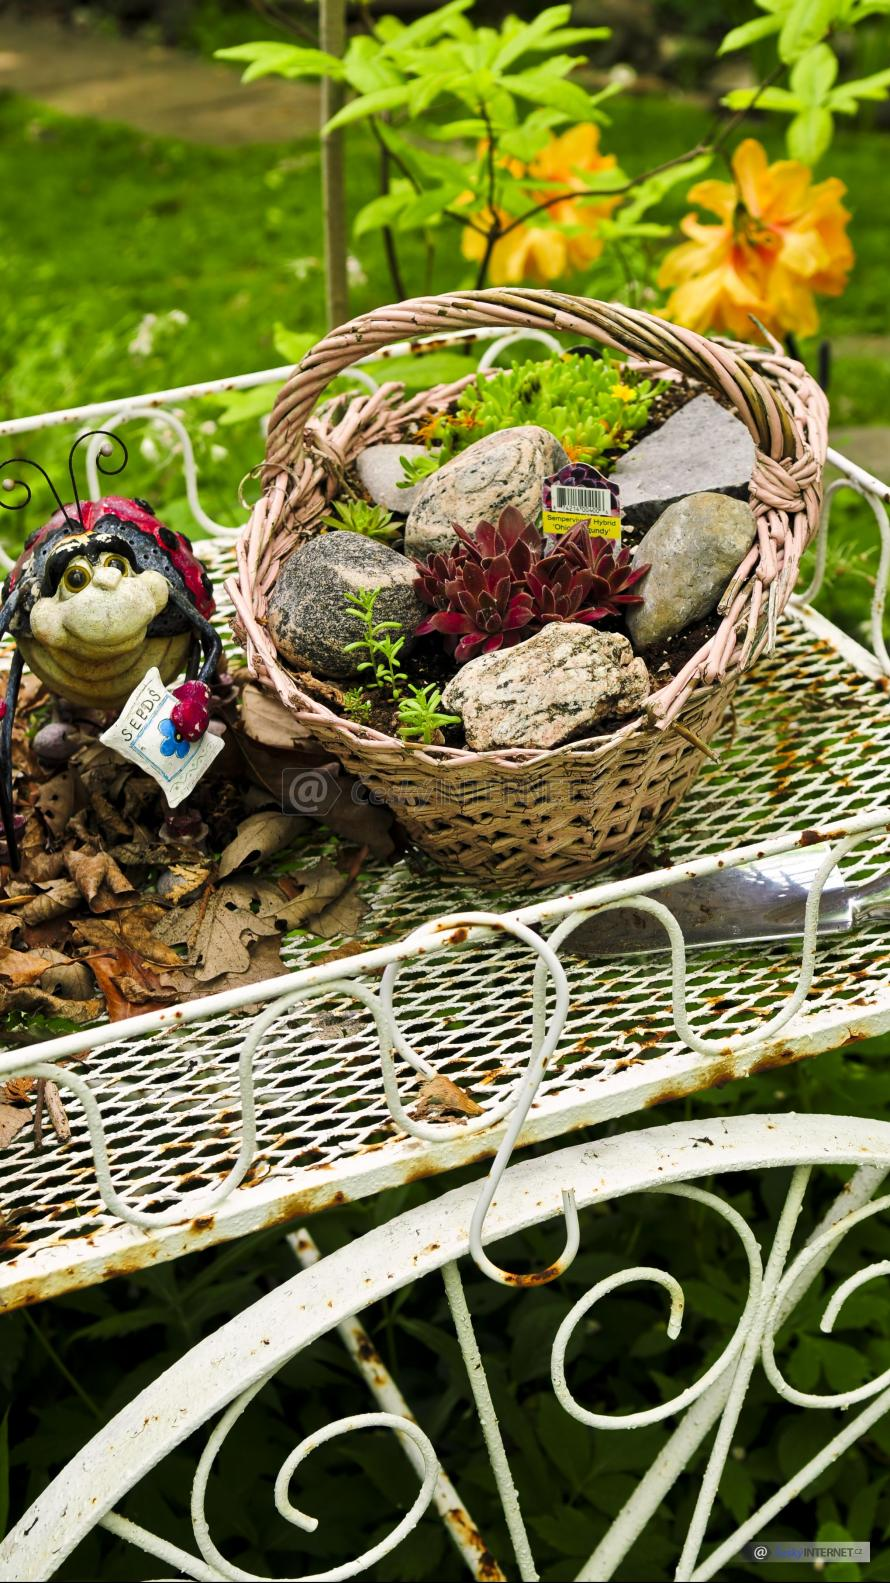 Aranž v okrasné zahradě, košík s rostlinami na kovovém nábytku.